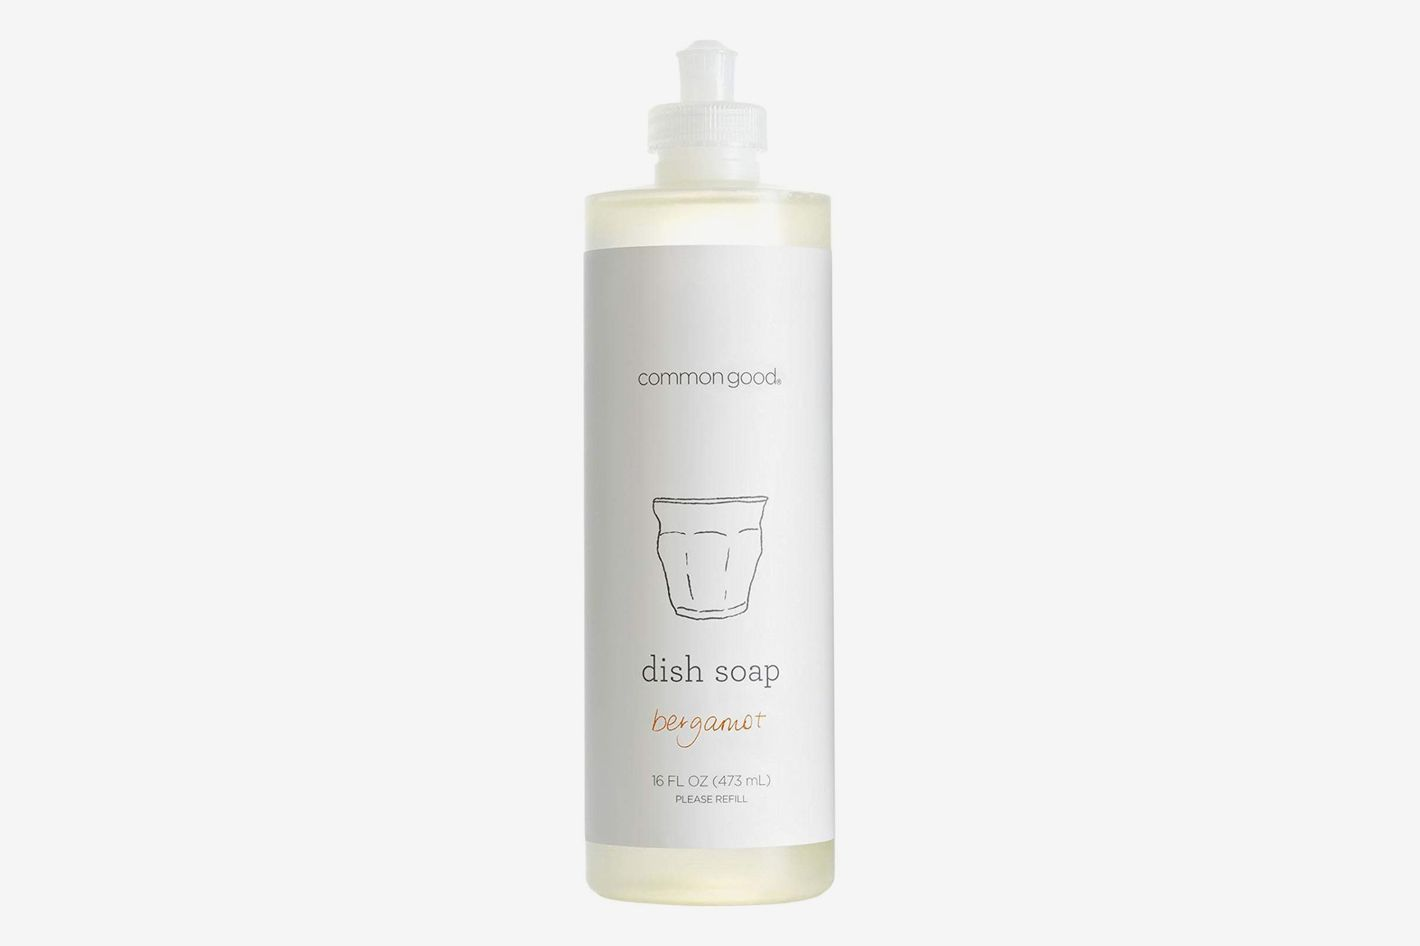 Common Good Dish Soap Bergamot